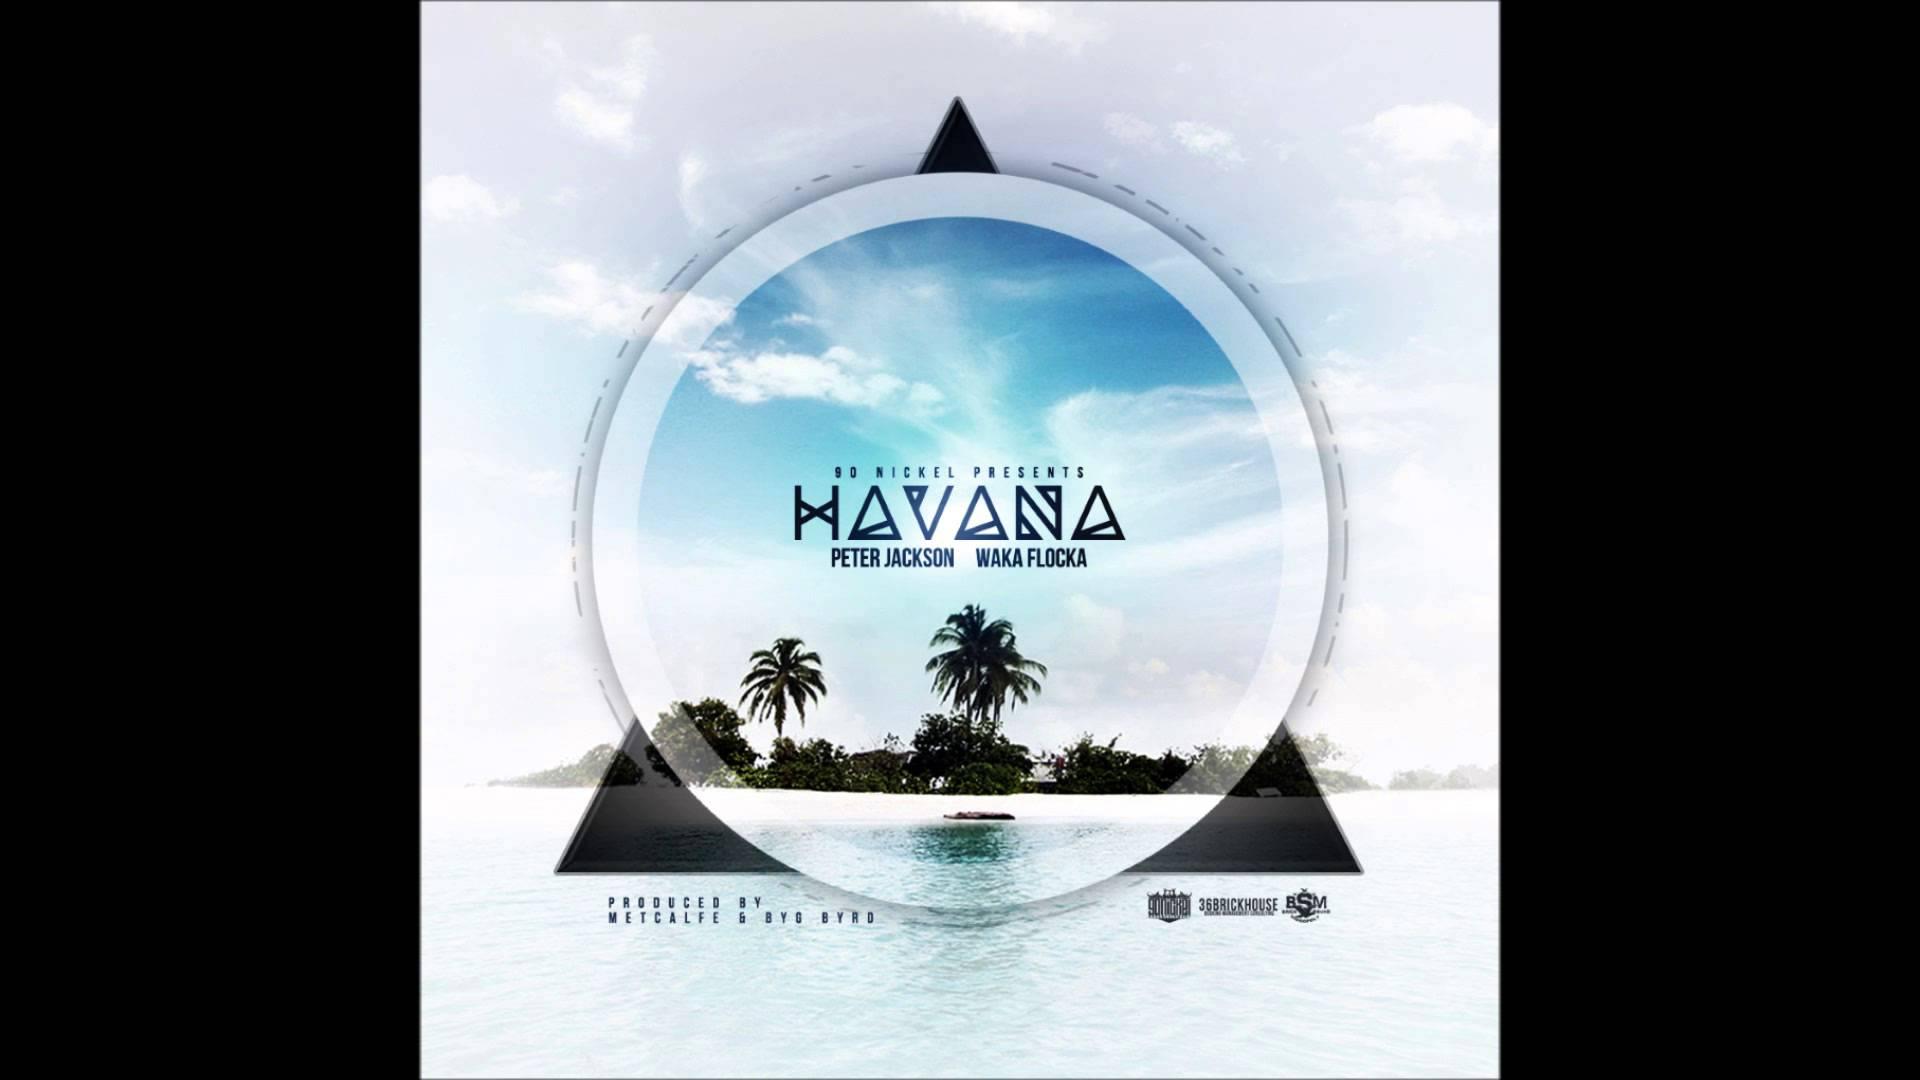 Peter Jackson Feat. Waka Flocka Flame – Havana